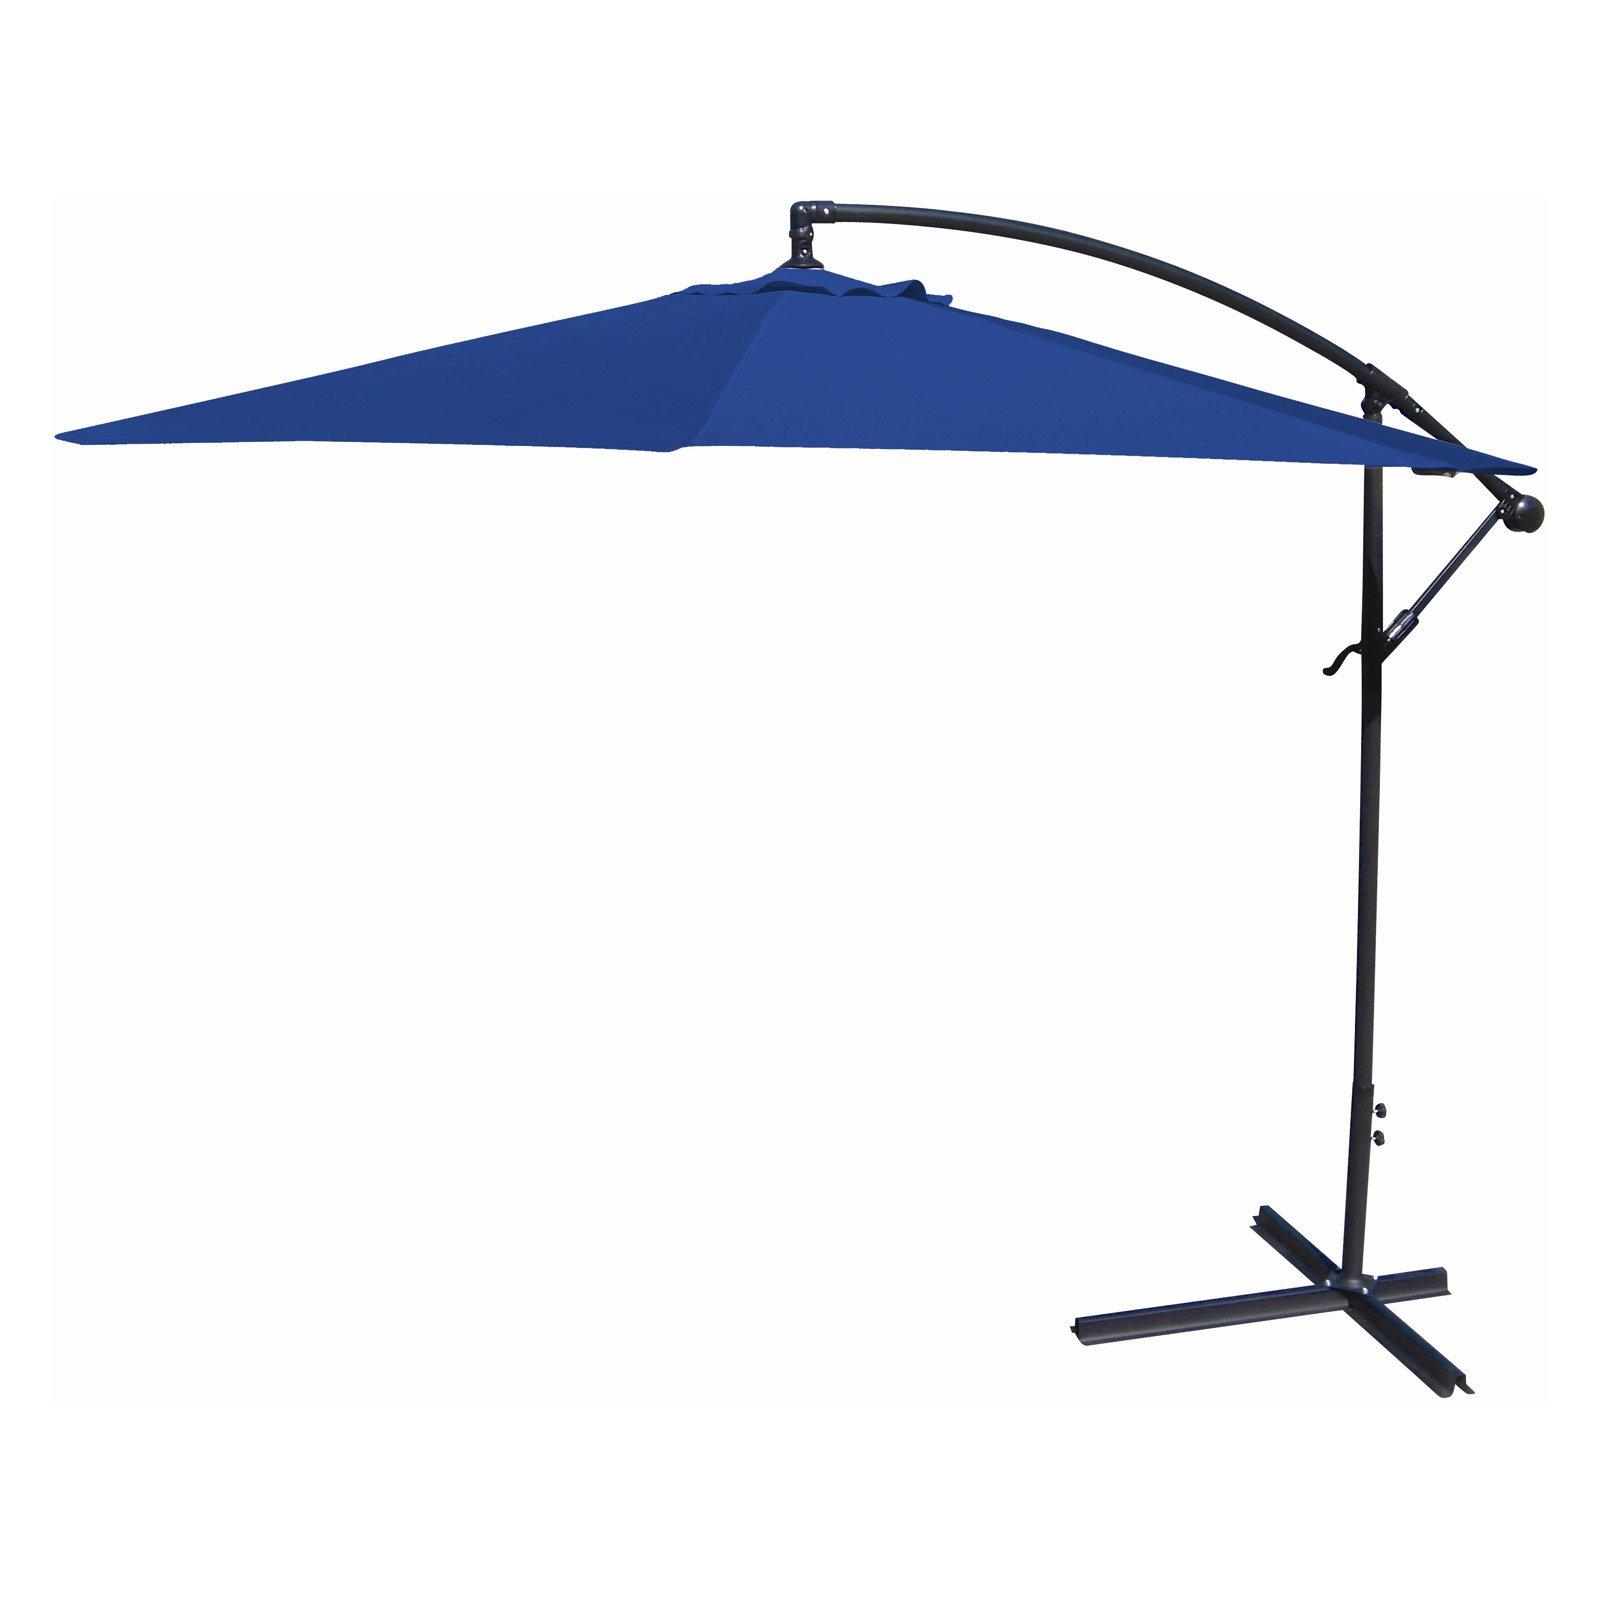 Jordan Manufacturing 10' Offset Umbrella, Multiple Colors